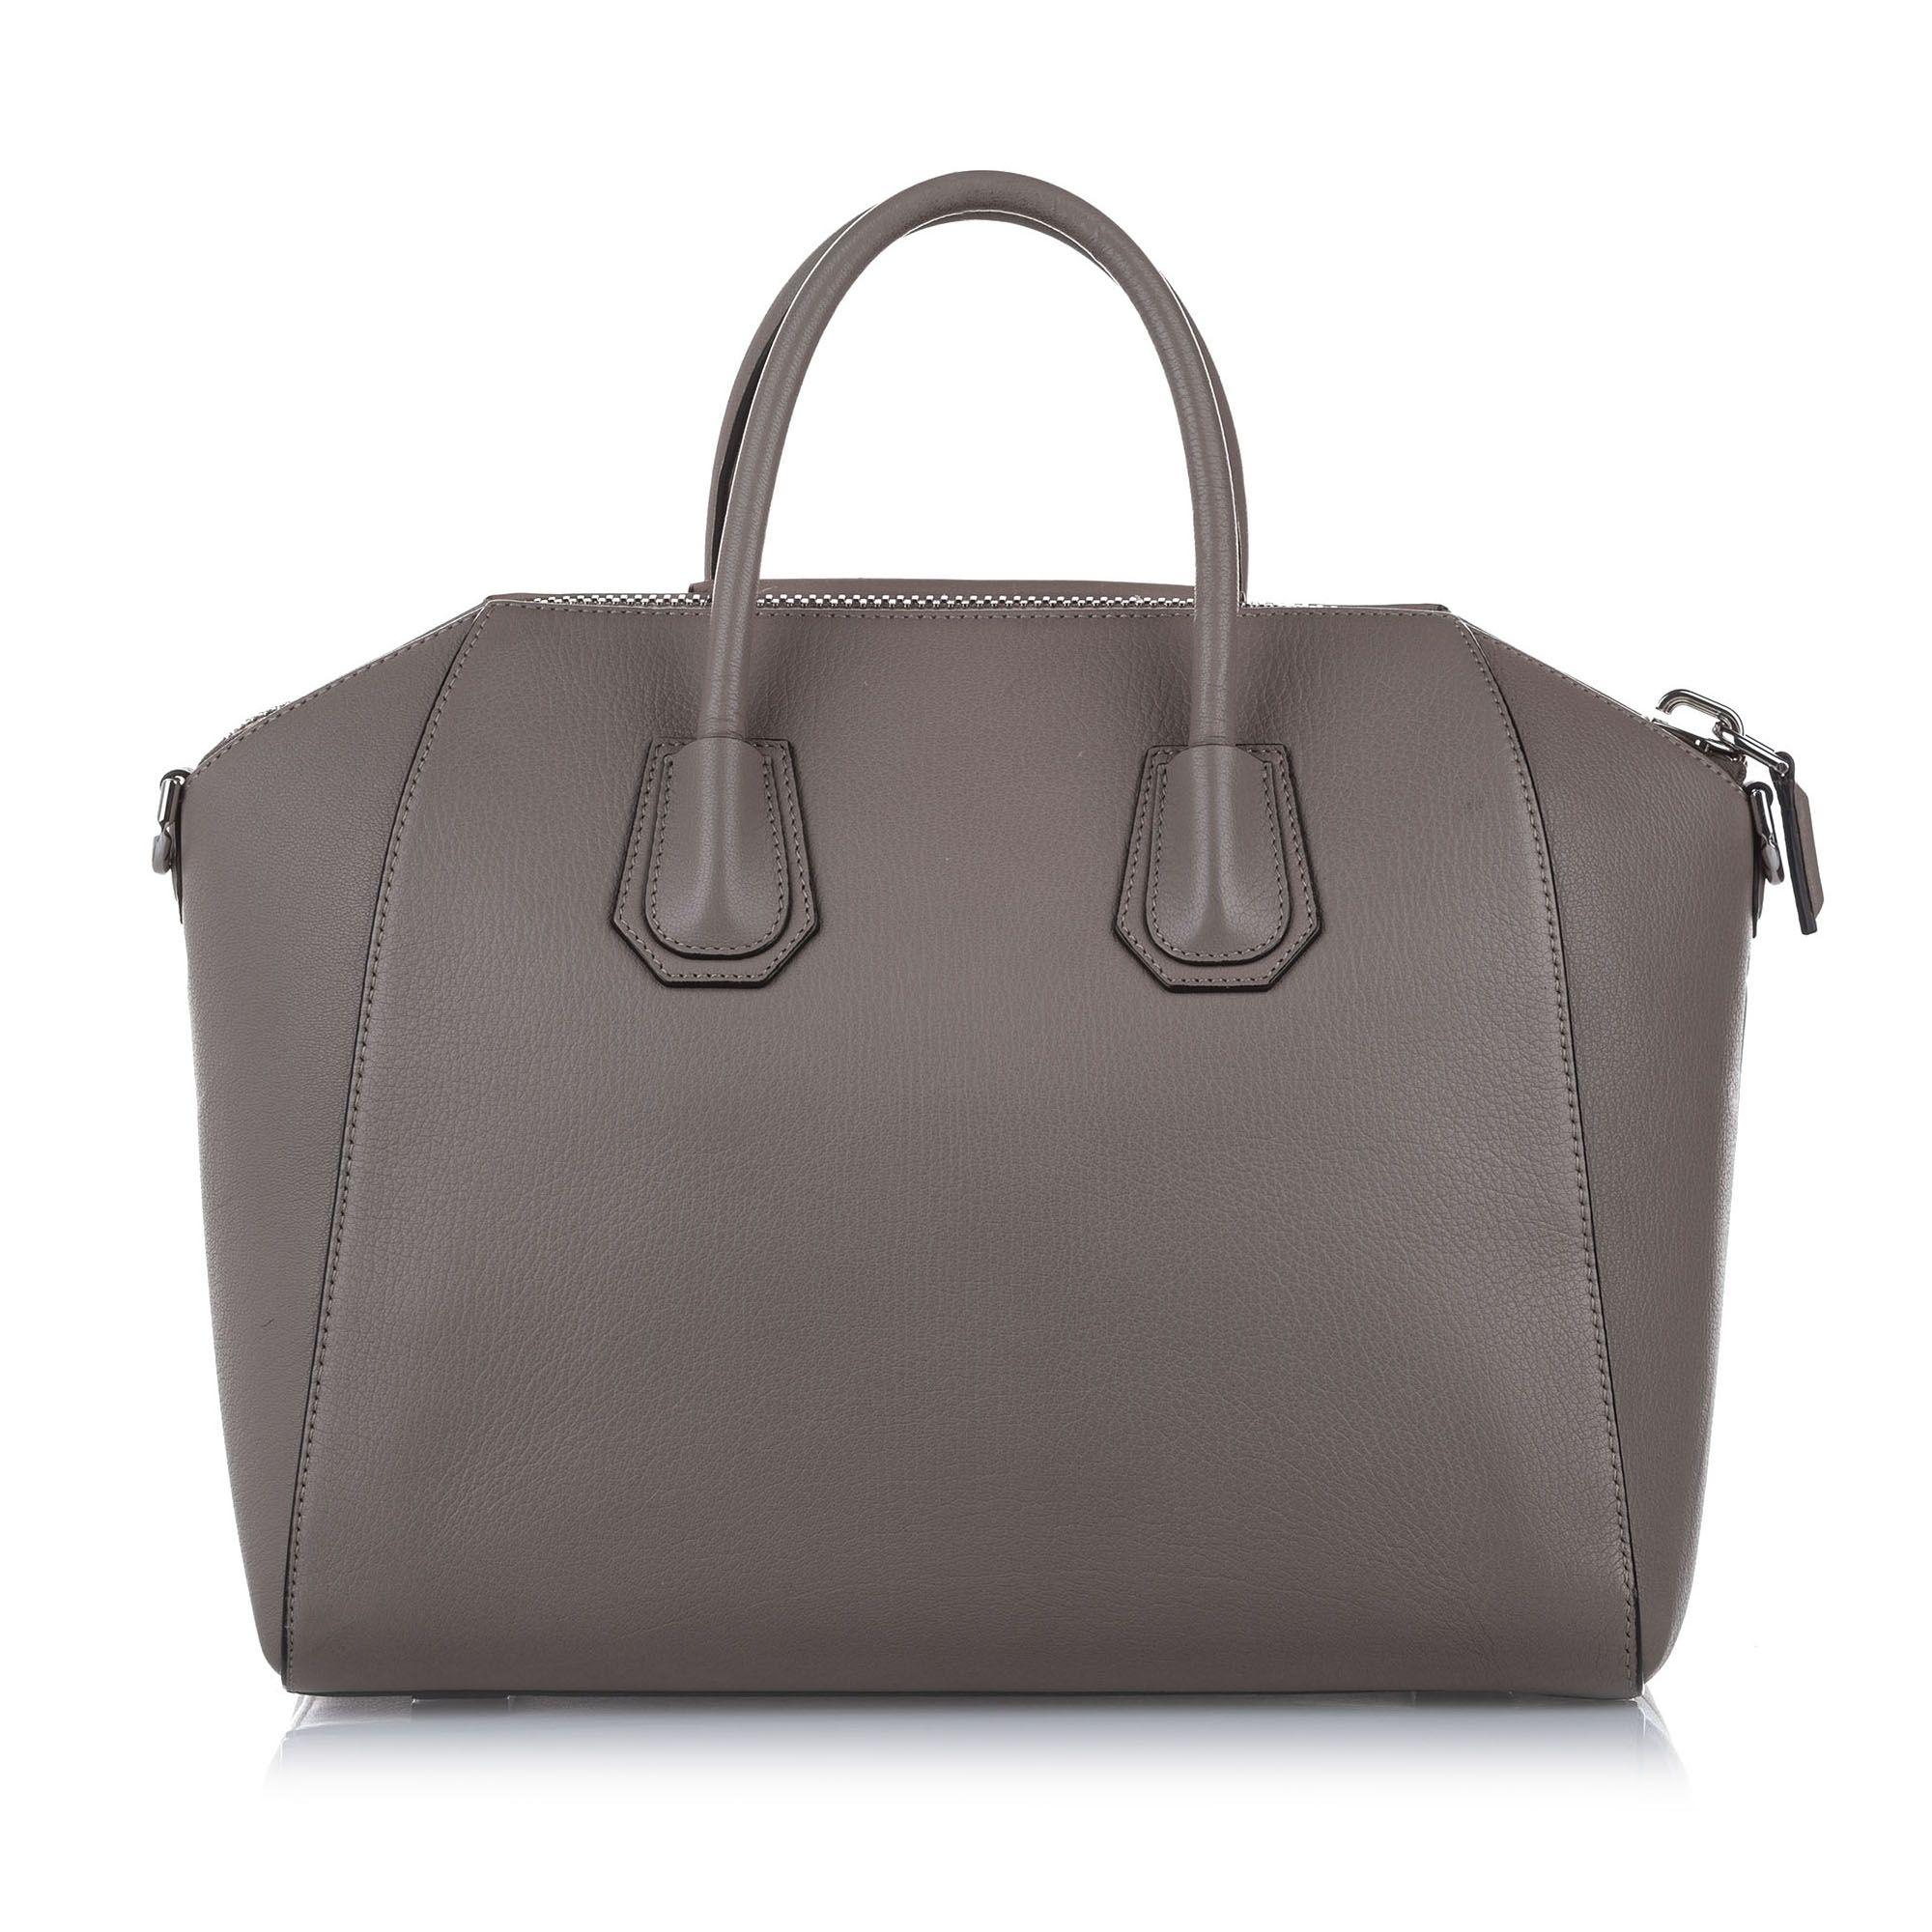 Vintage Givenchy Medium Antigona Leather Satchel Brown